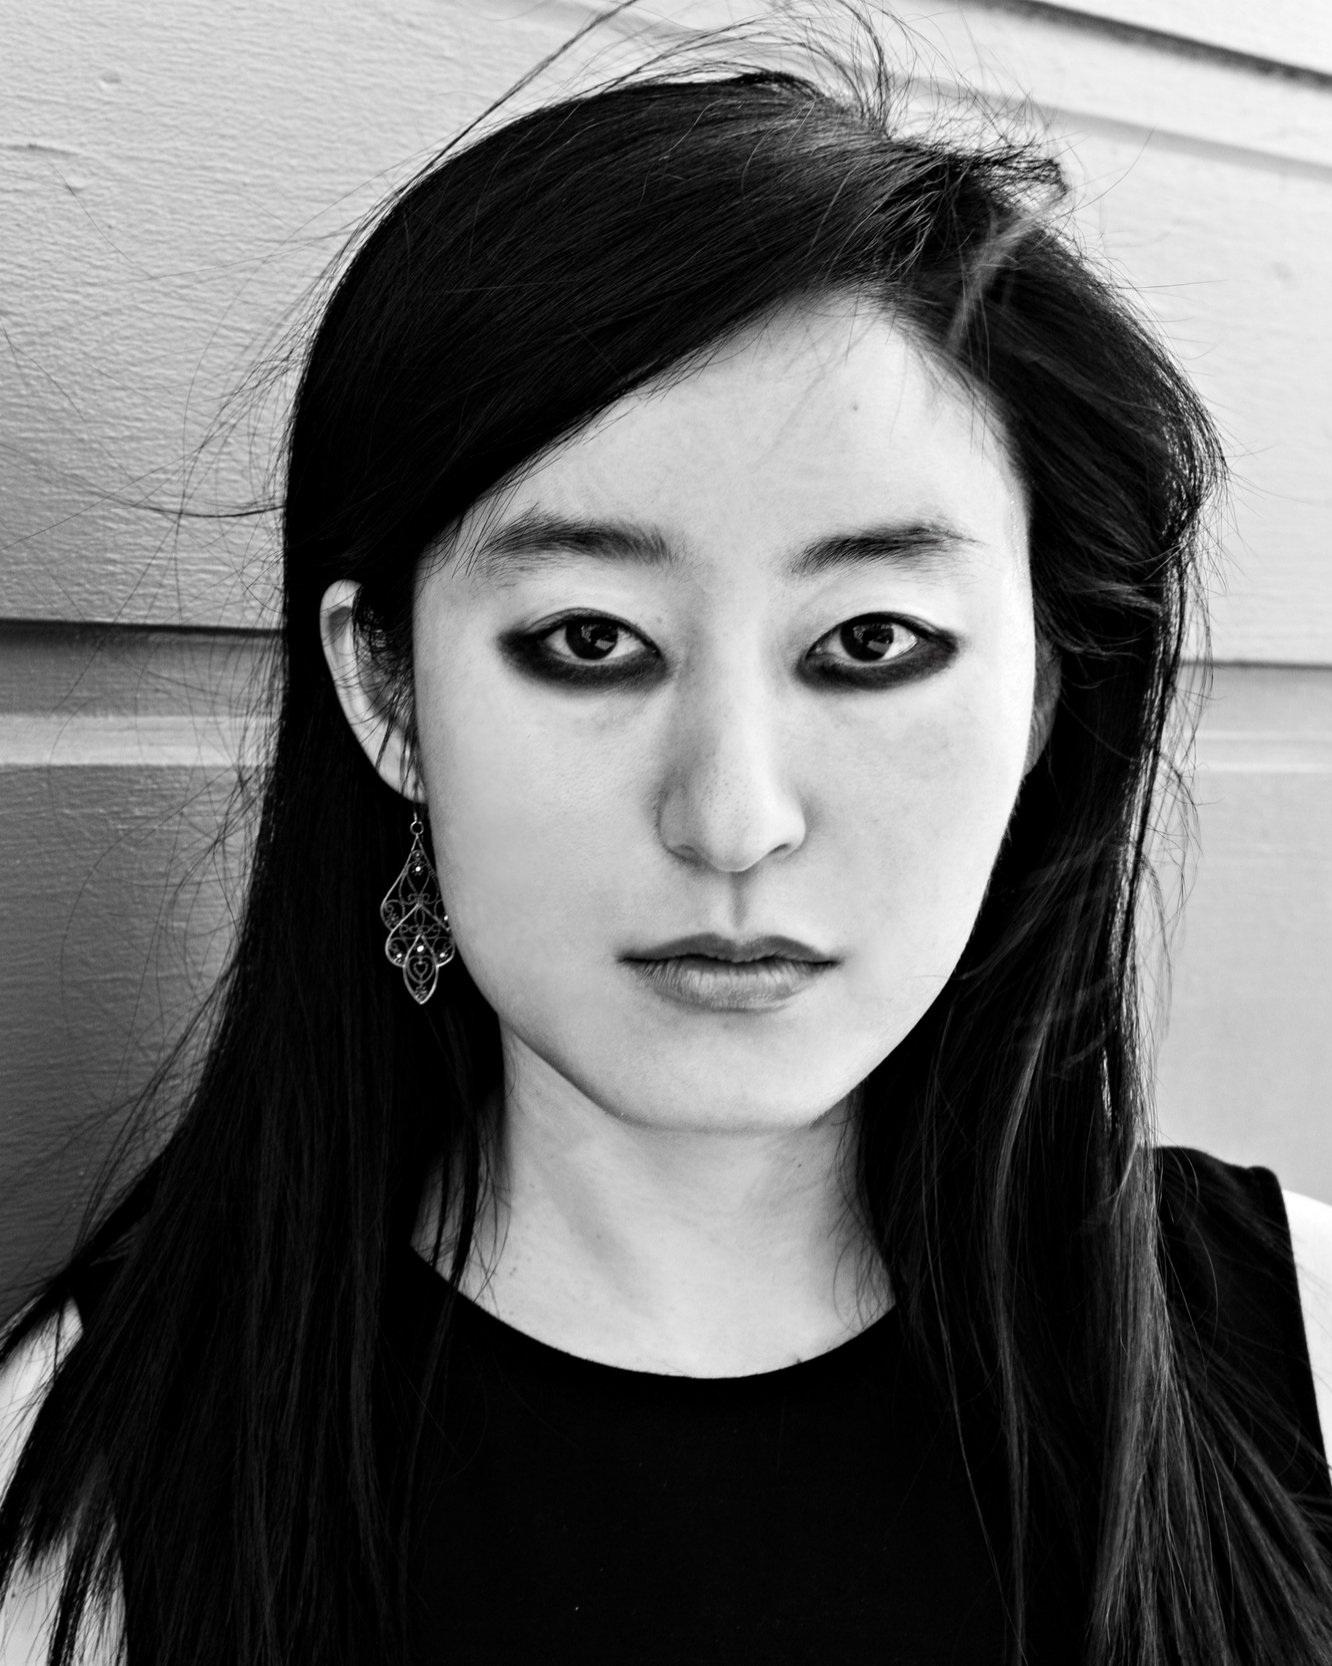 Kwon official headshot - Smeeta Mahanti (1).jpg